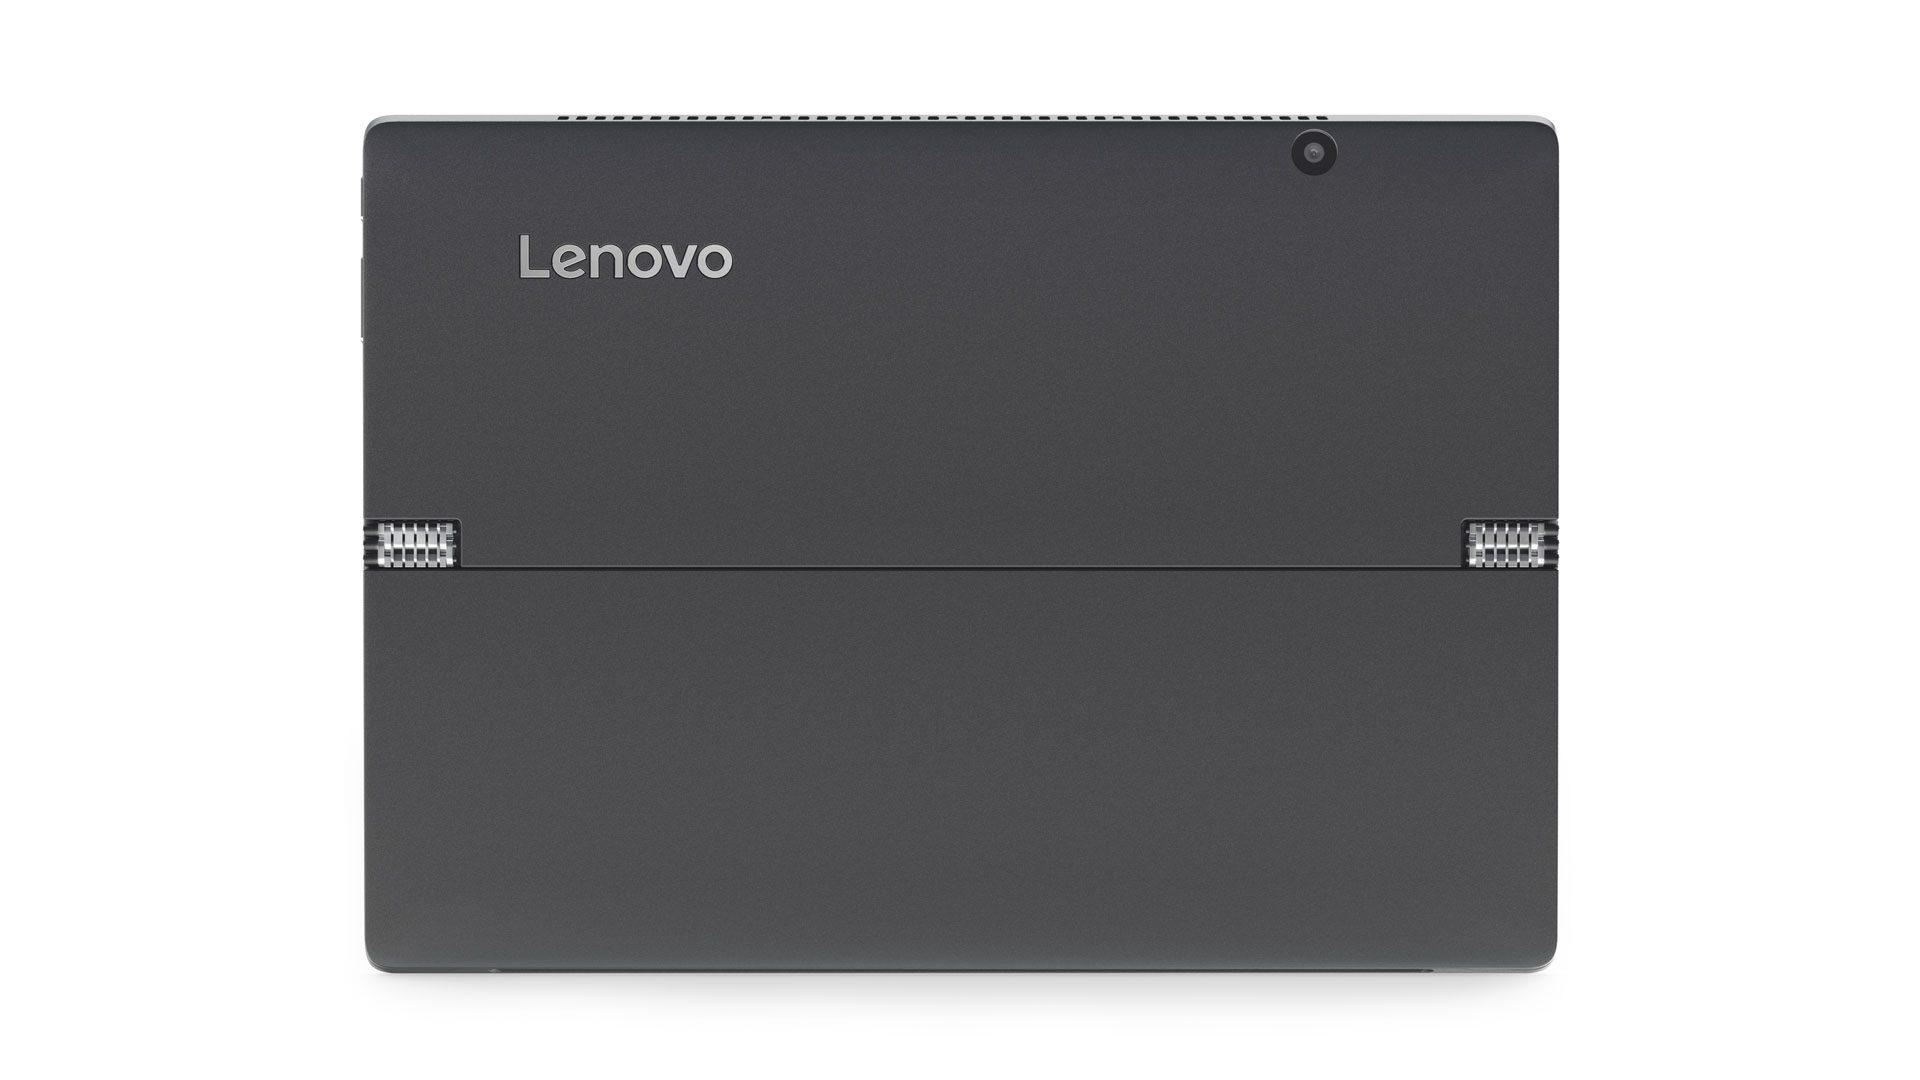 Lenovo-MIIX-720-12IKB_Ansicht-11